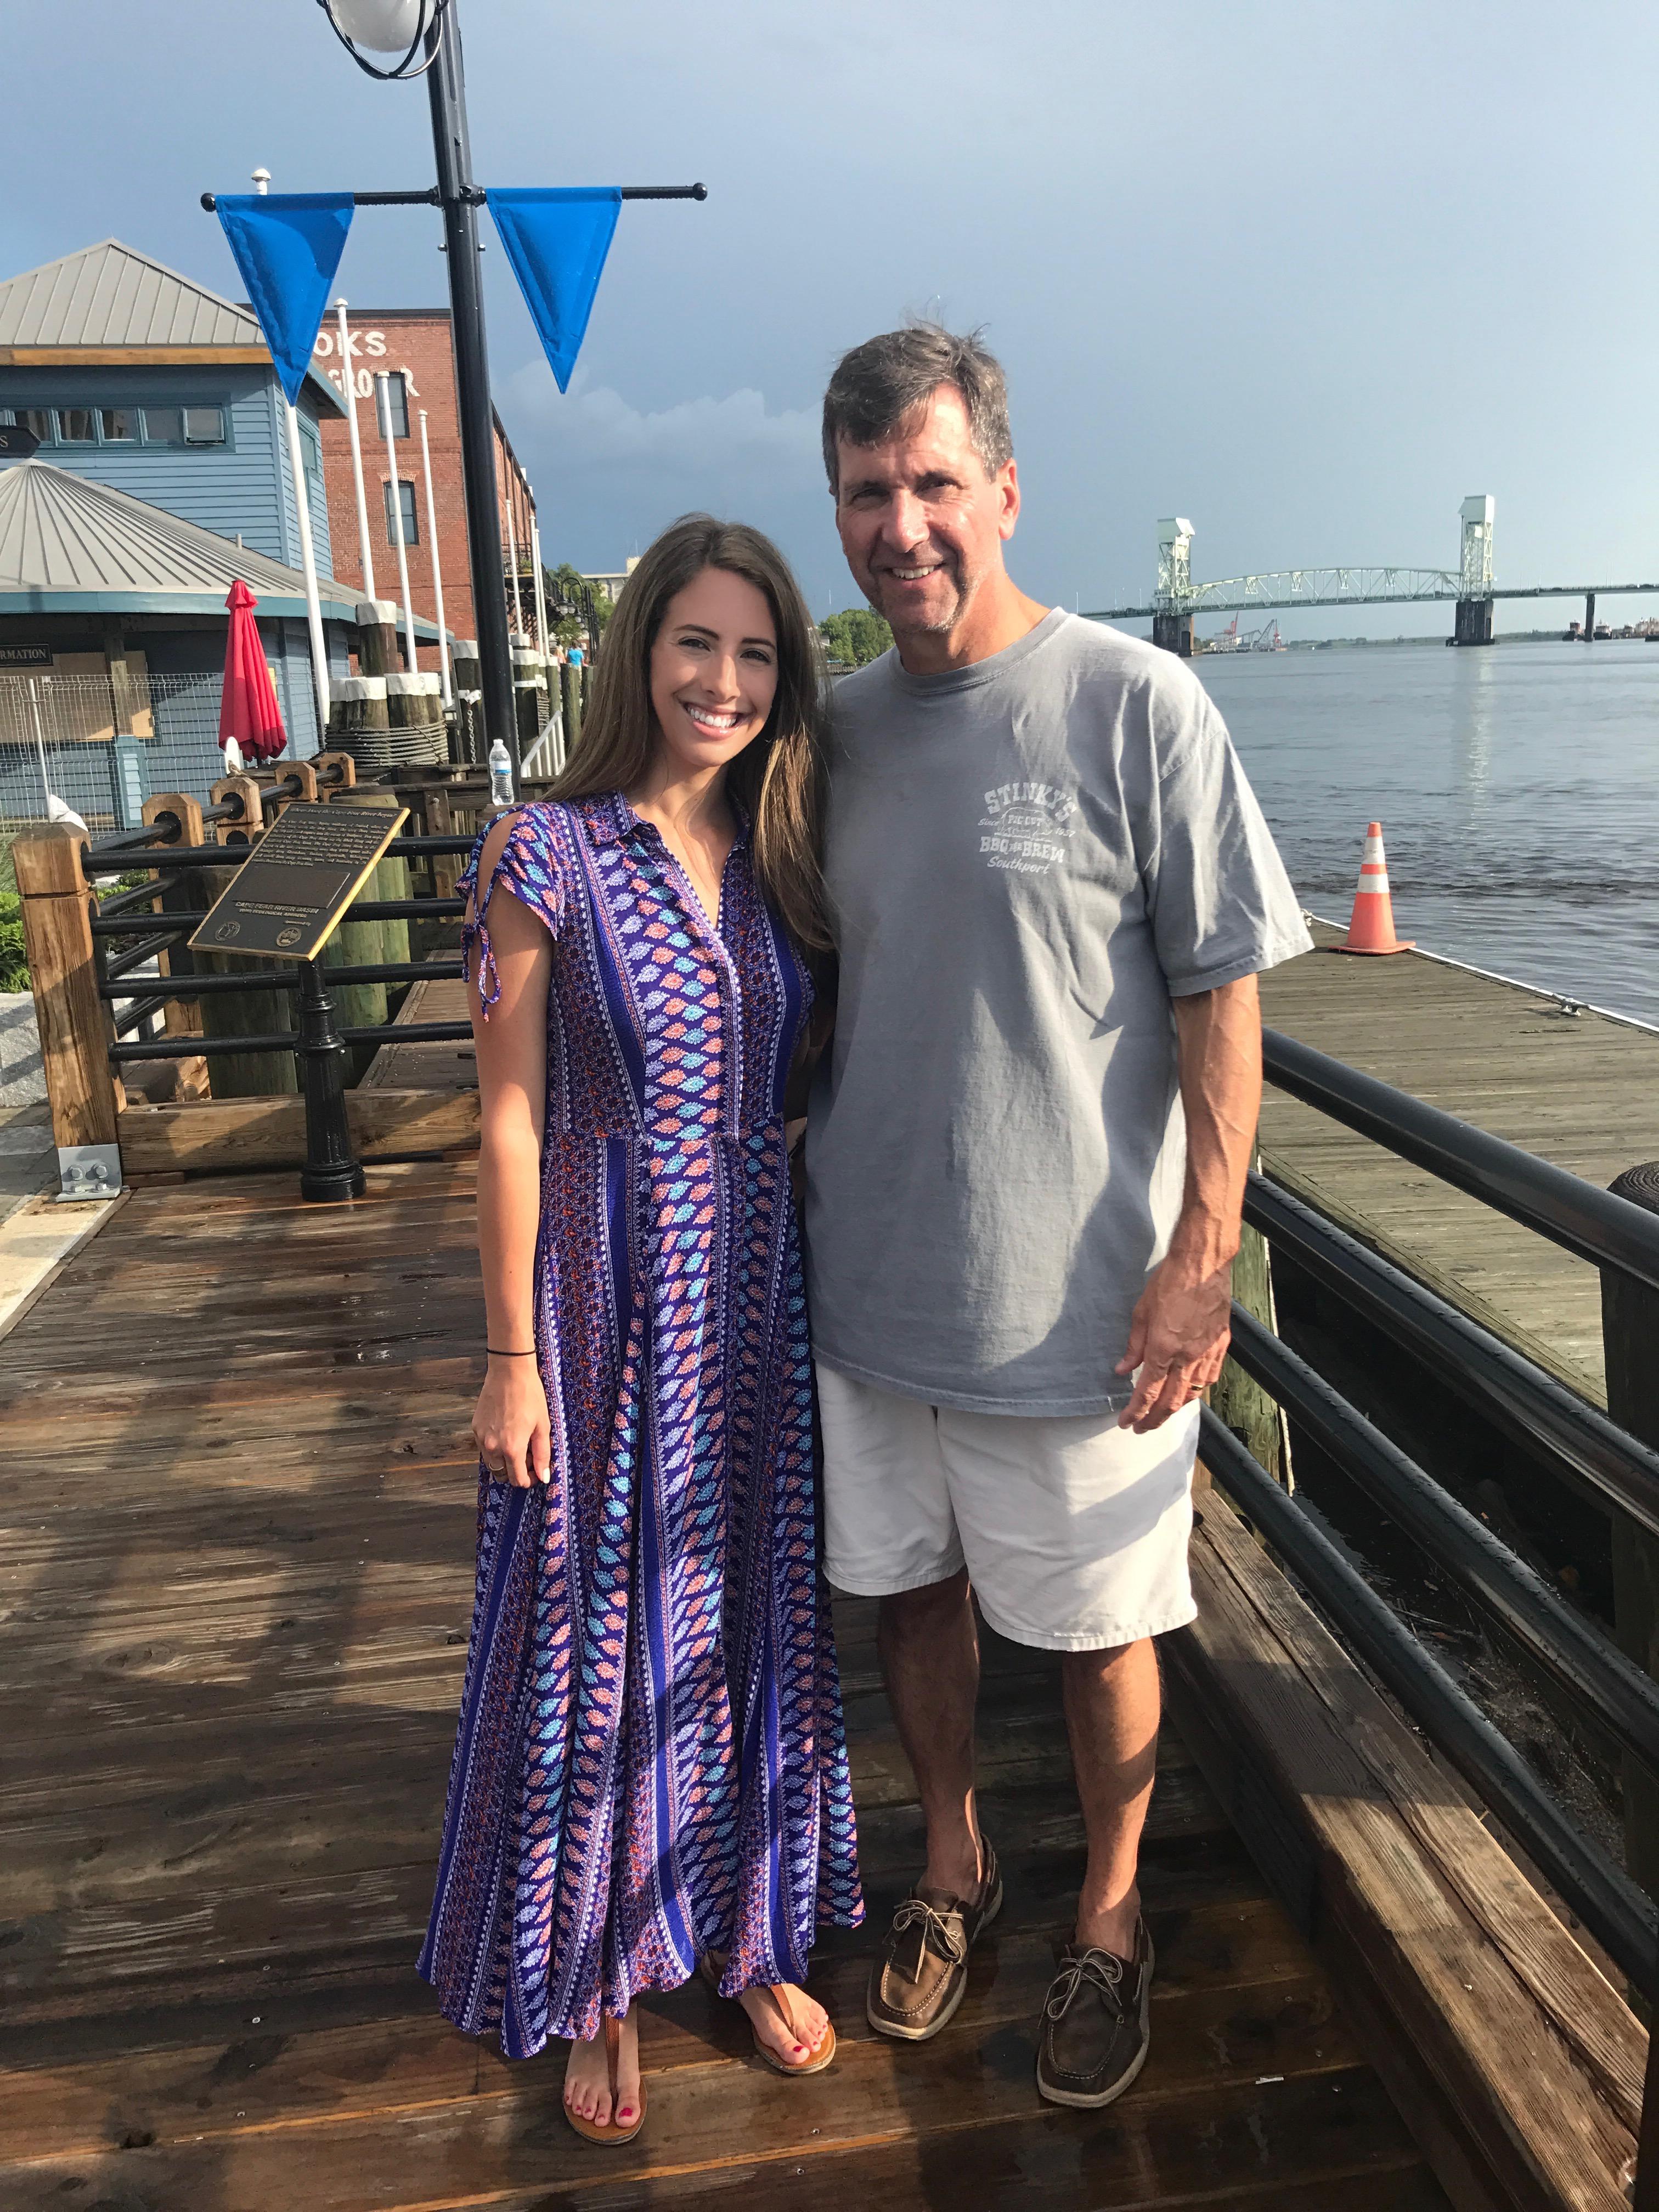 North-Carolina-dad